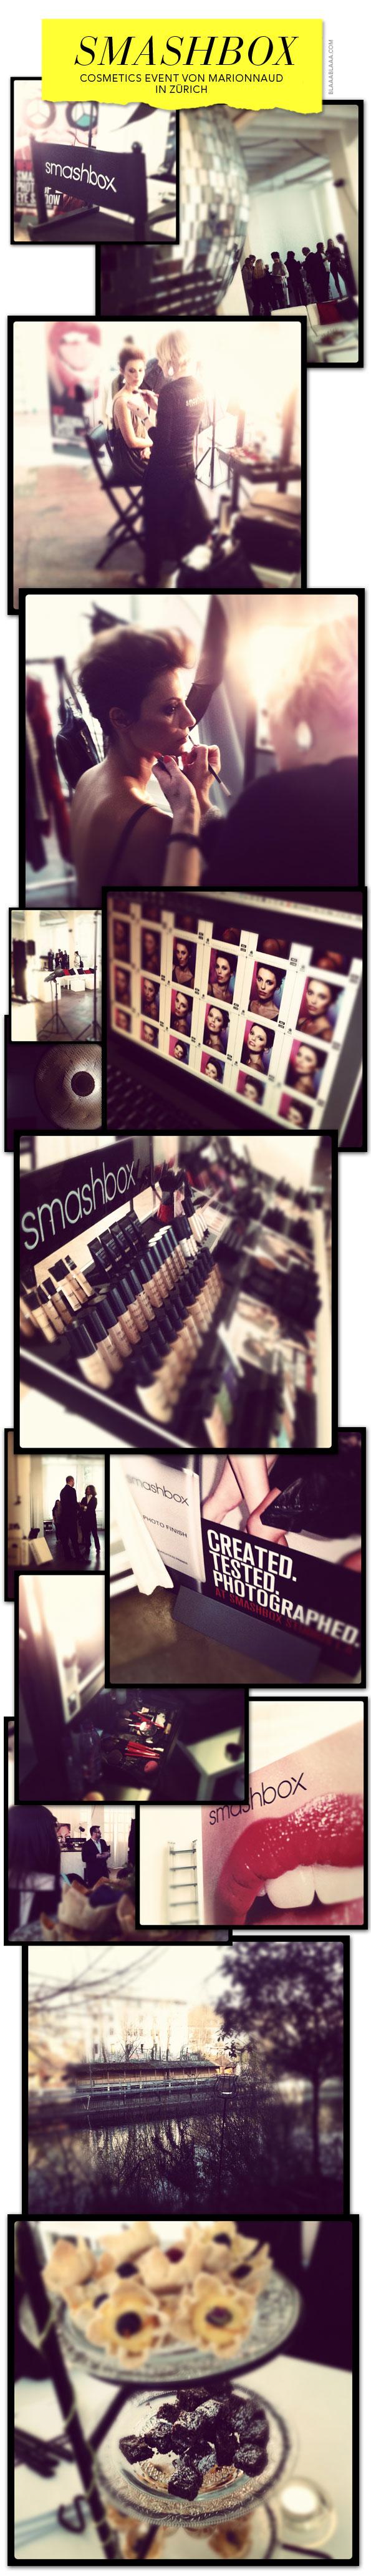 Smashbox Cosmetics Event by Marionnaud